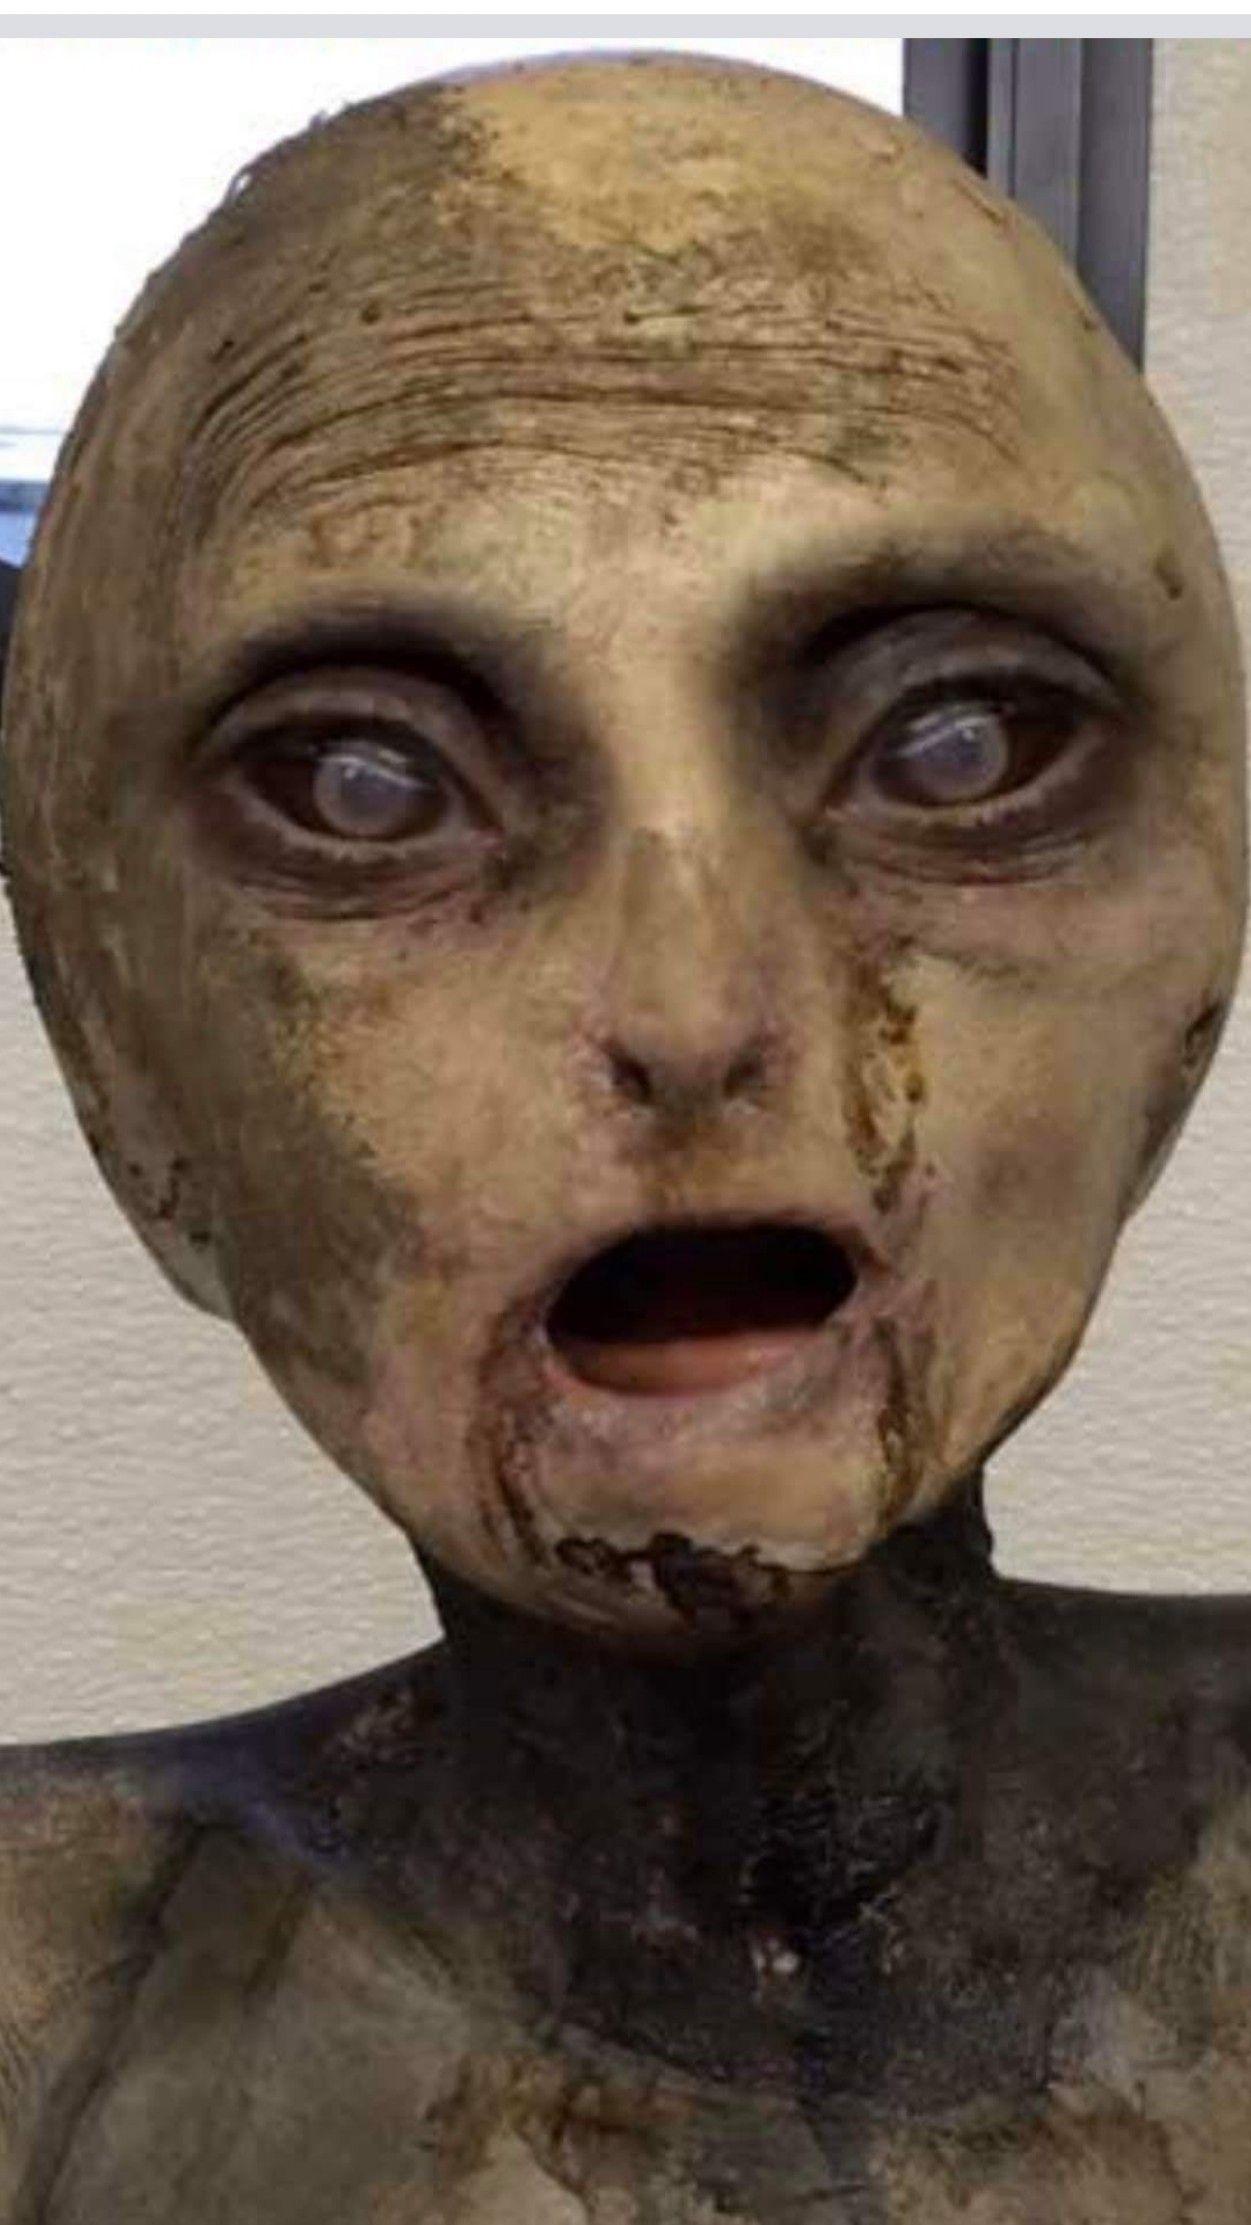 Alien Cadaver in 2020 Halloween face makeup, Face makeup